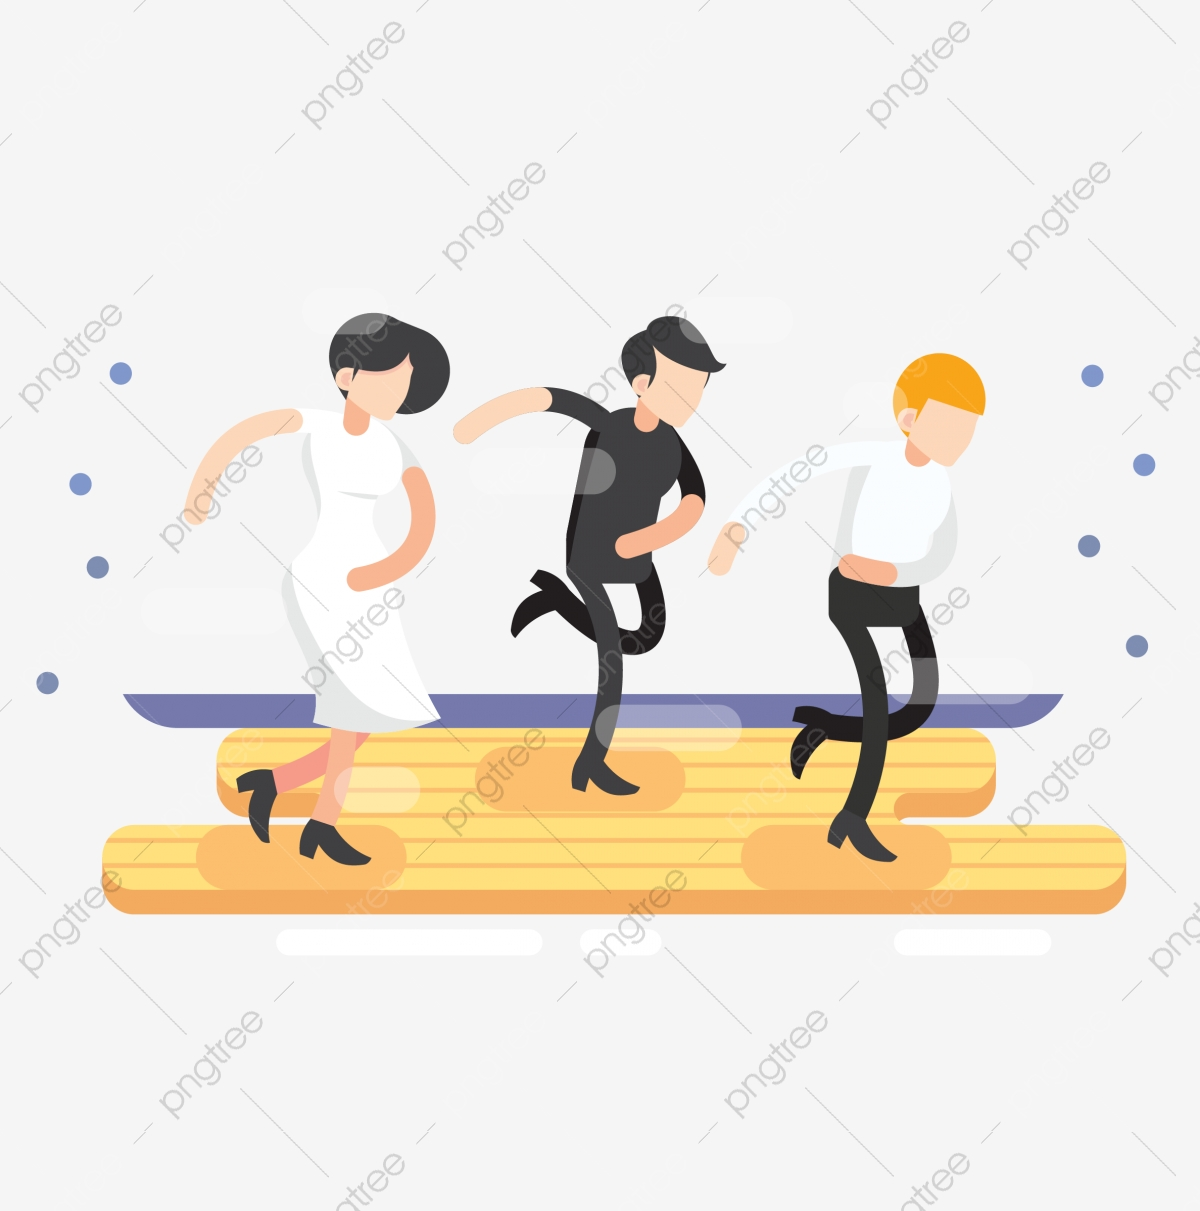 Motion dance man png. Movement clipart dnace